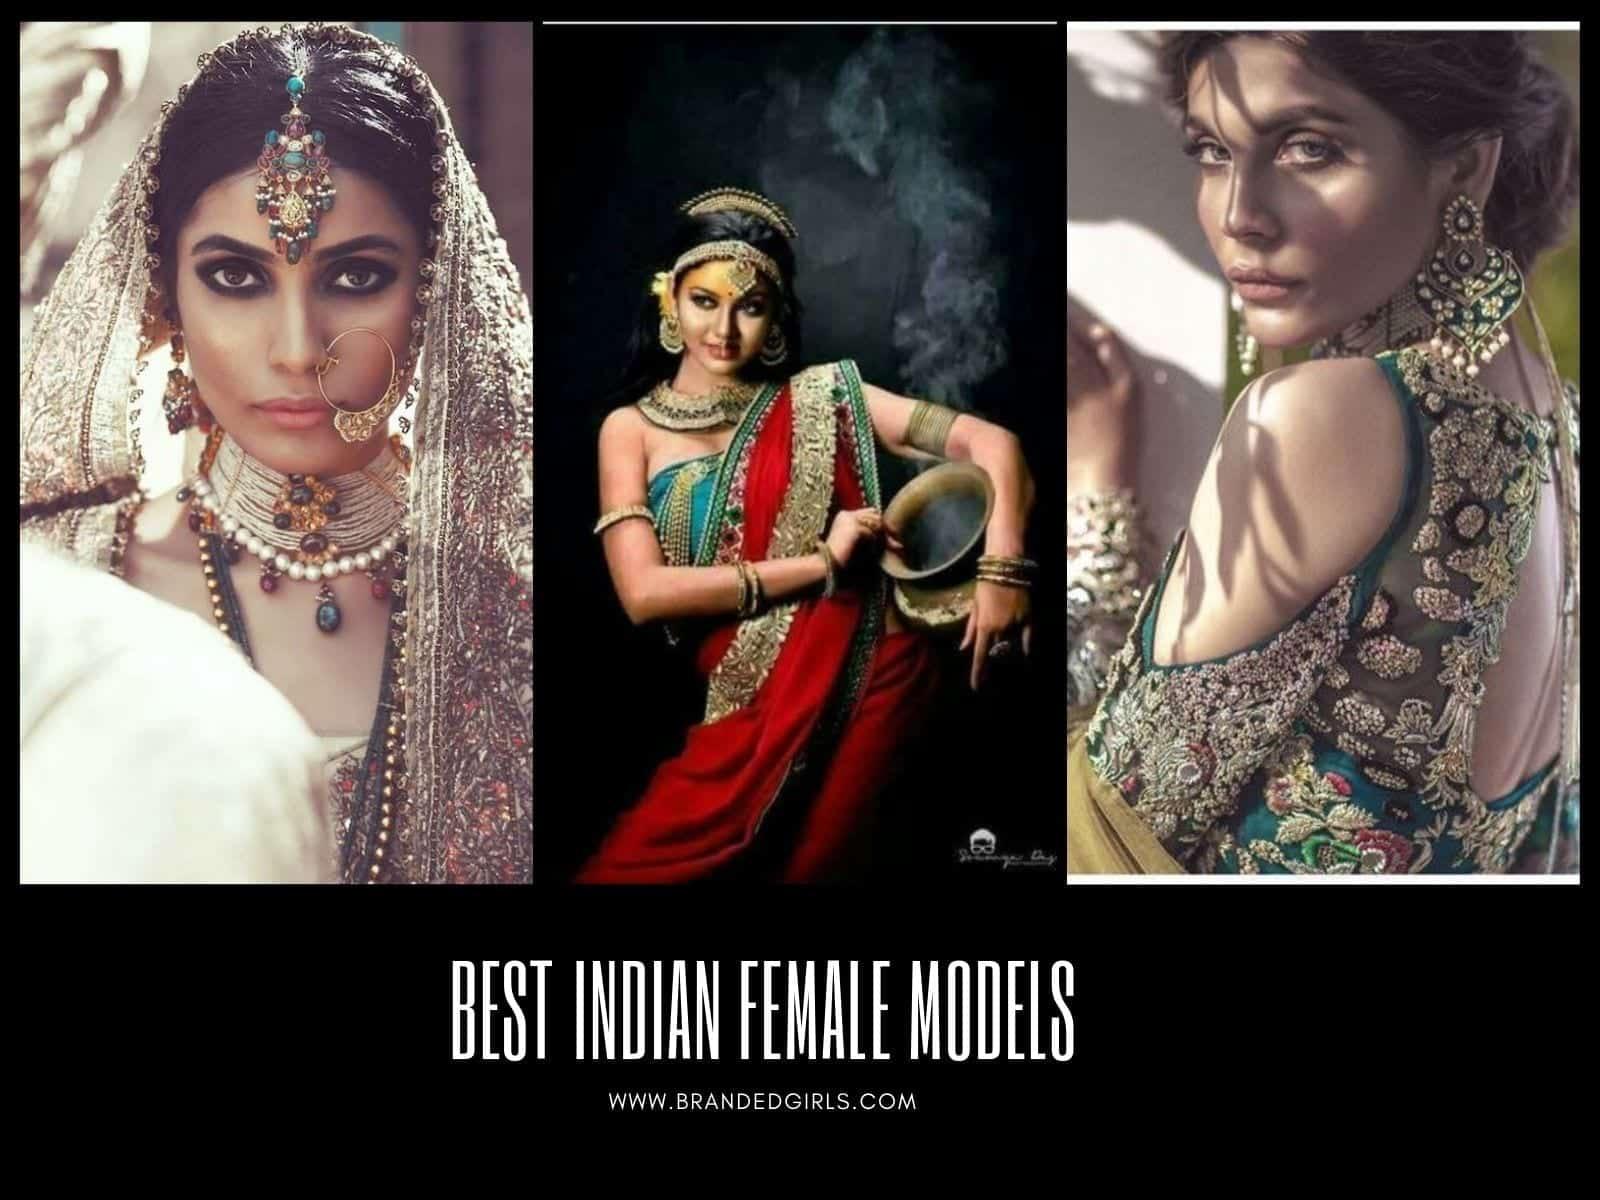 Indian-Female-Models Top 10 Indian Female Models 2019 - Updated List